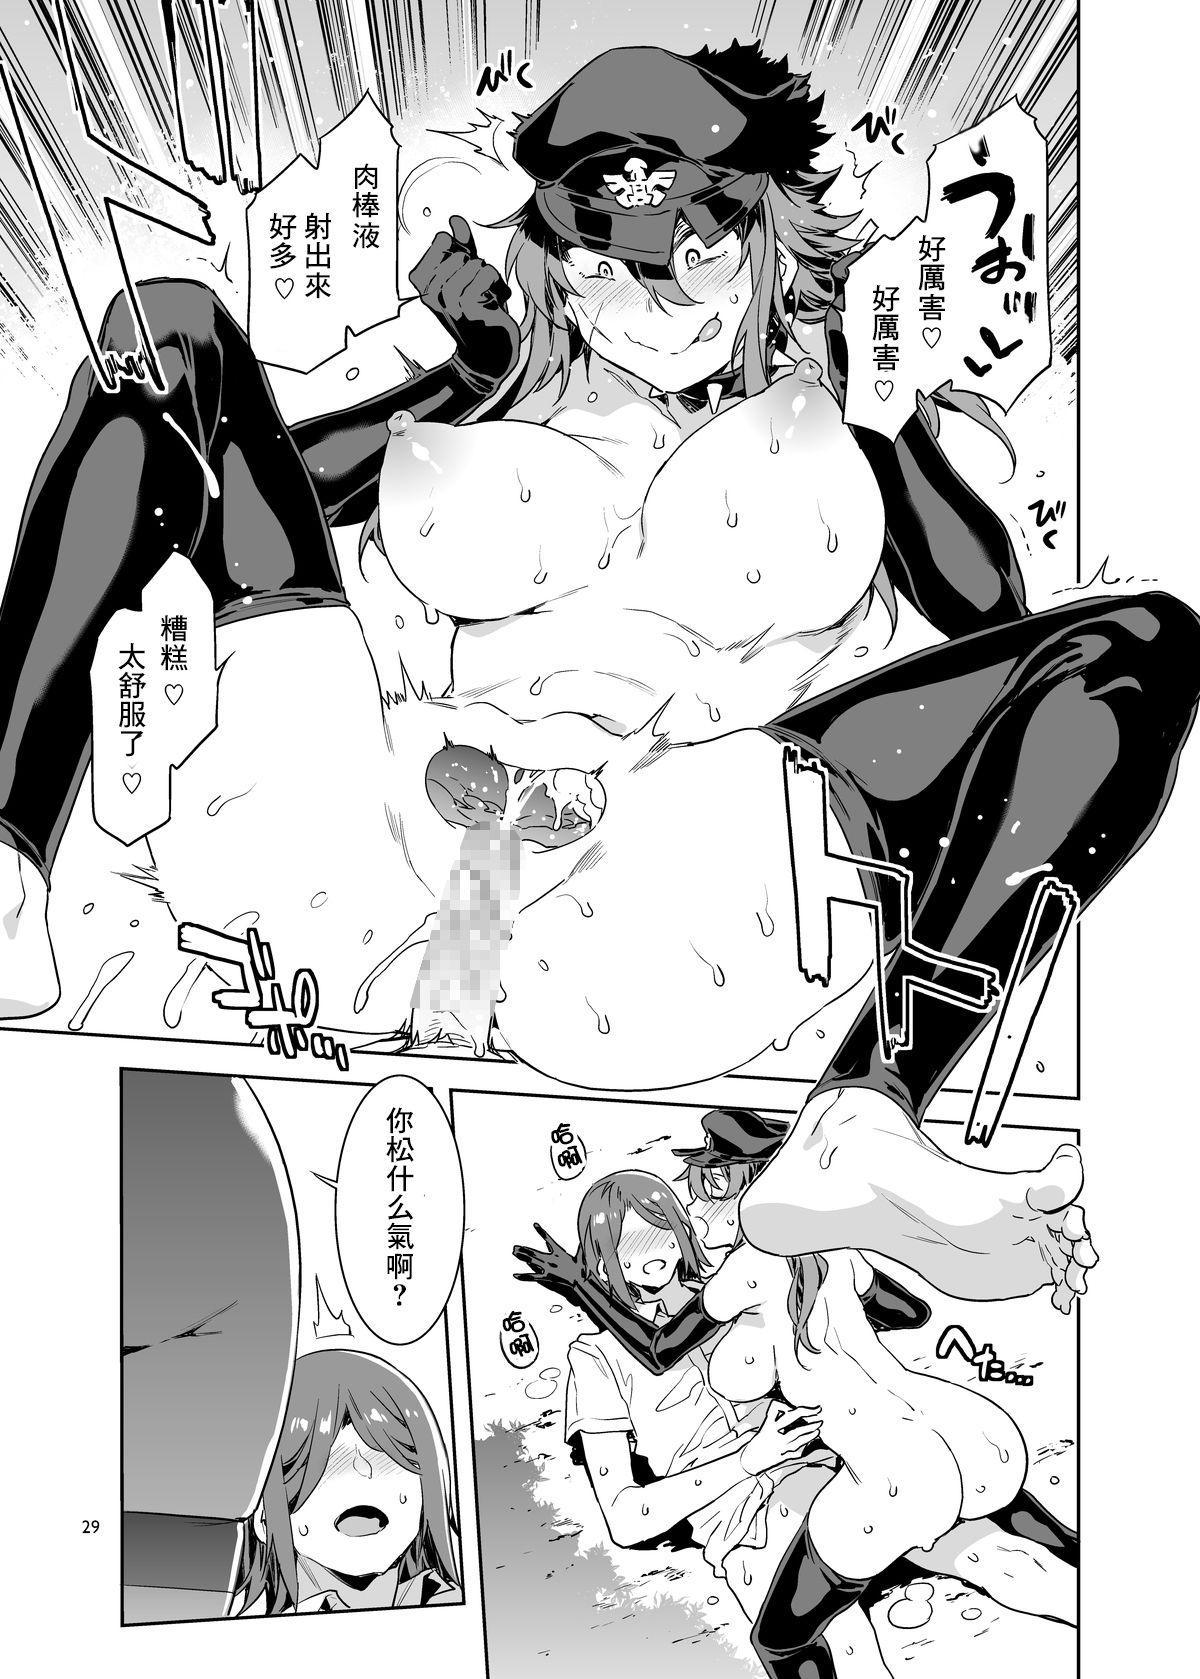 Teisou Kannen Zero no Onna Banchou 28